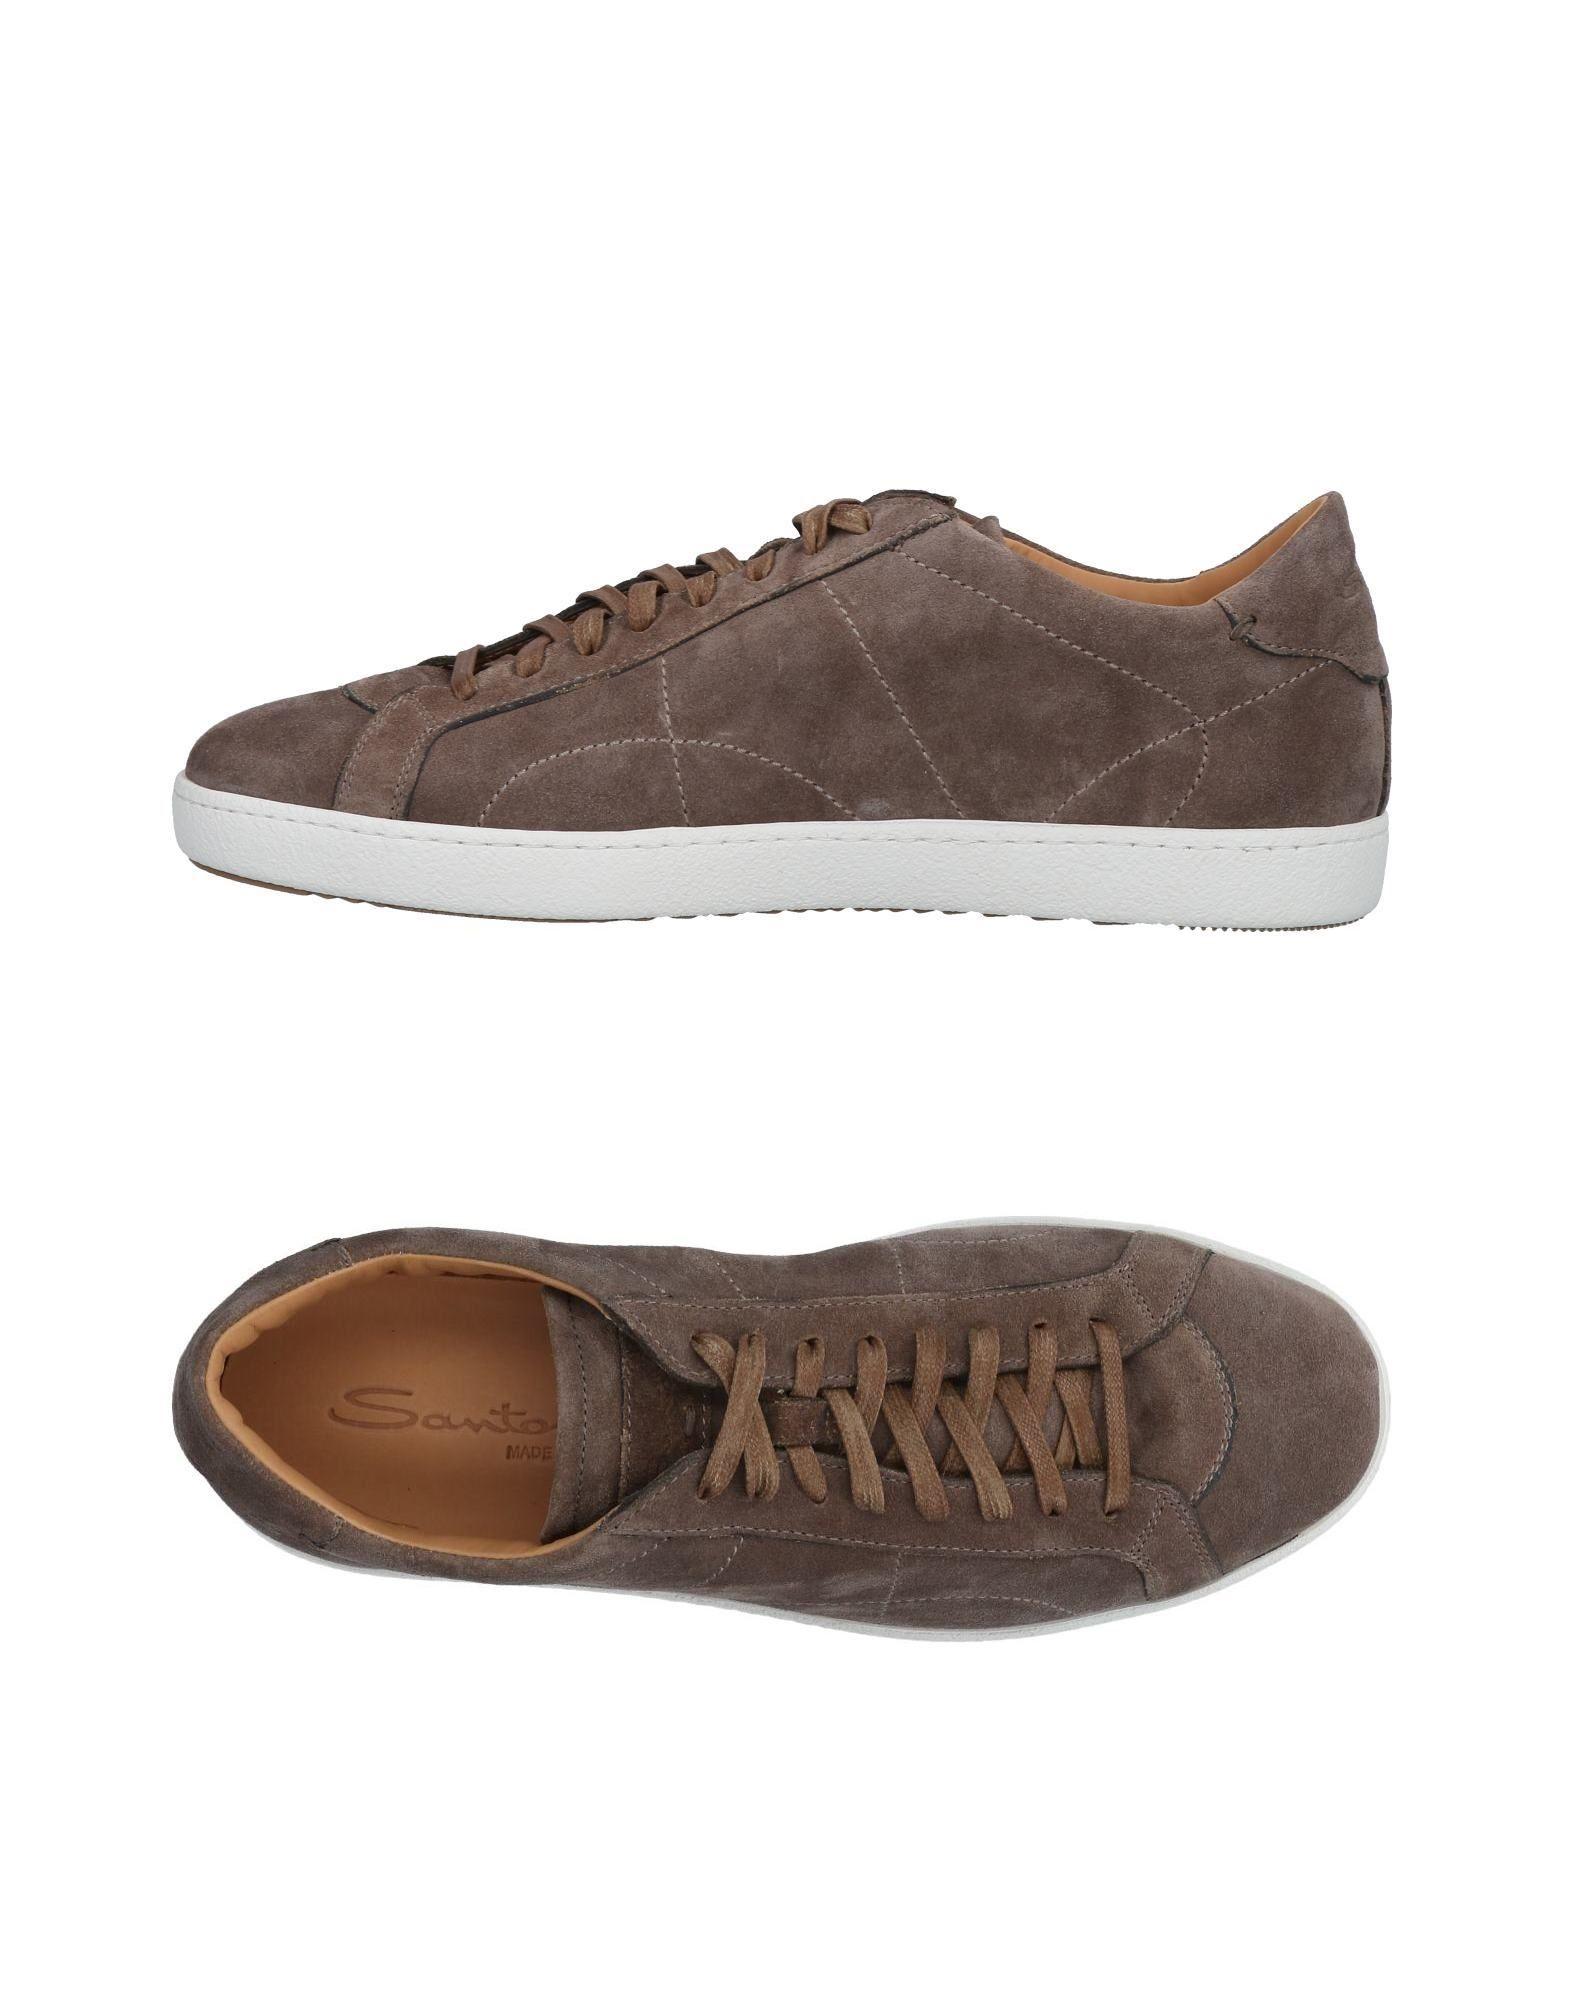 Sneakers Santoni Donna - Acquista online su